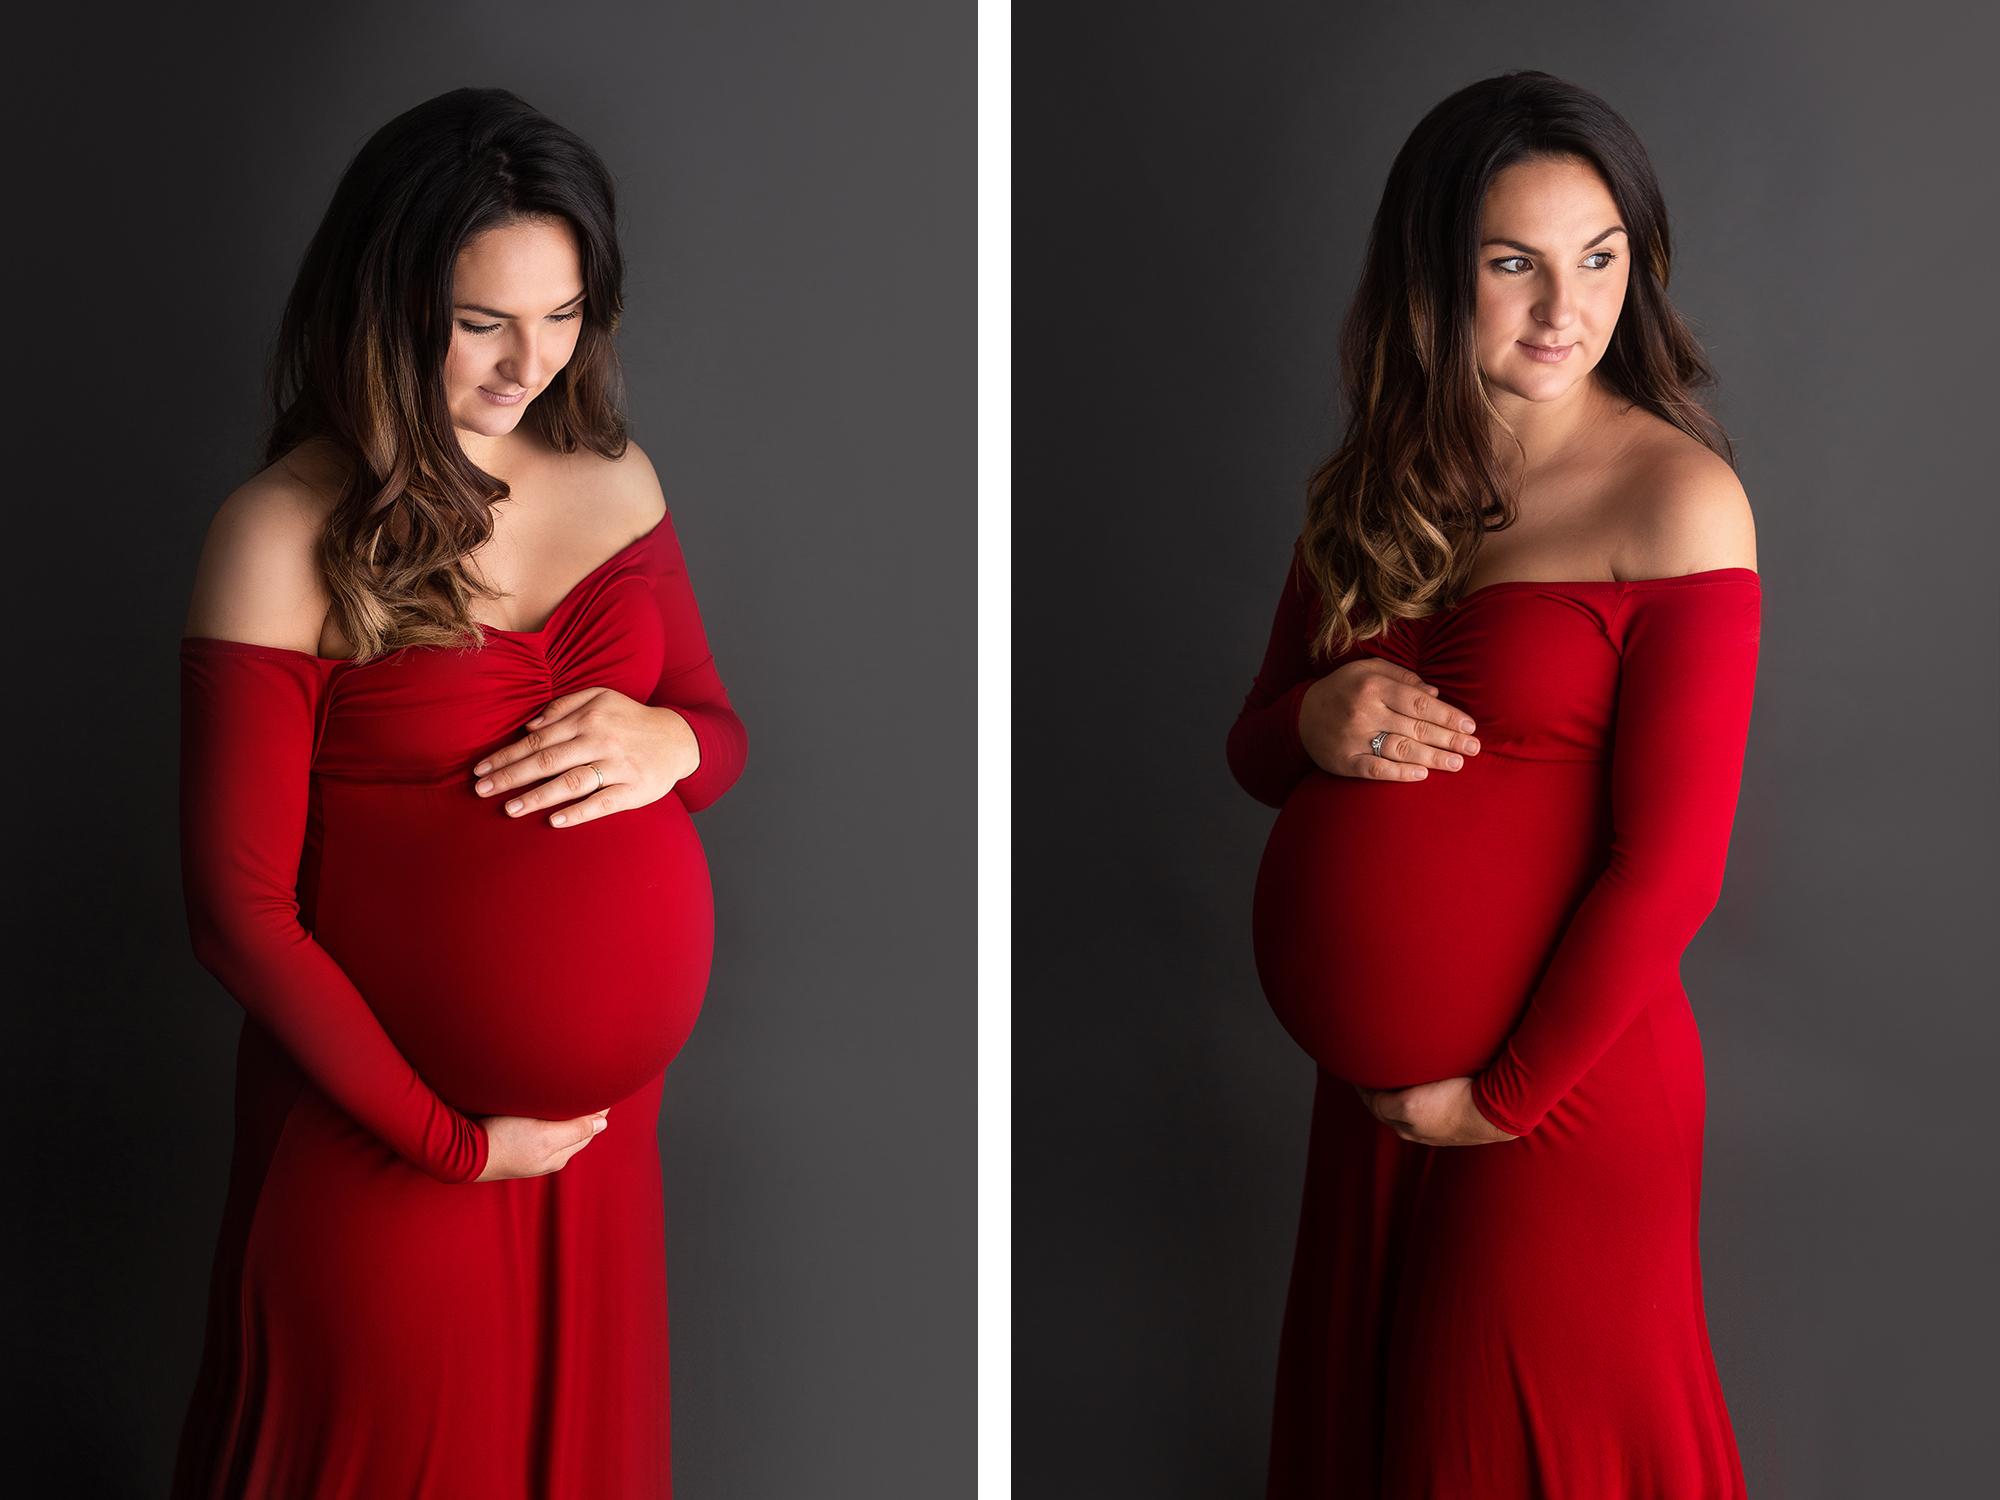 Schwangerschaftsfotoshooting bei Ludwigsburg